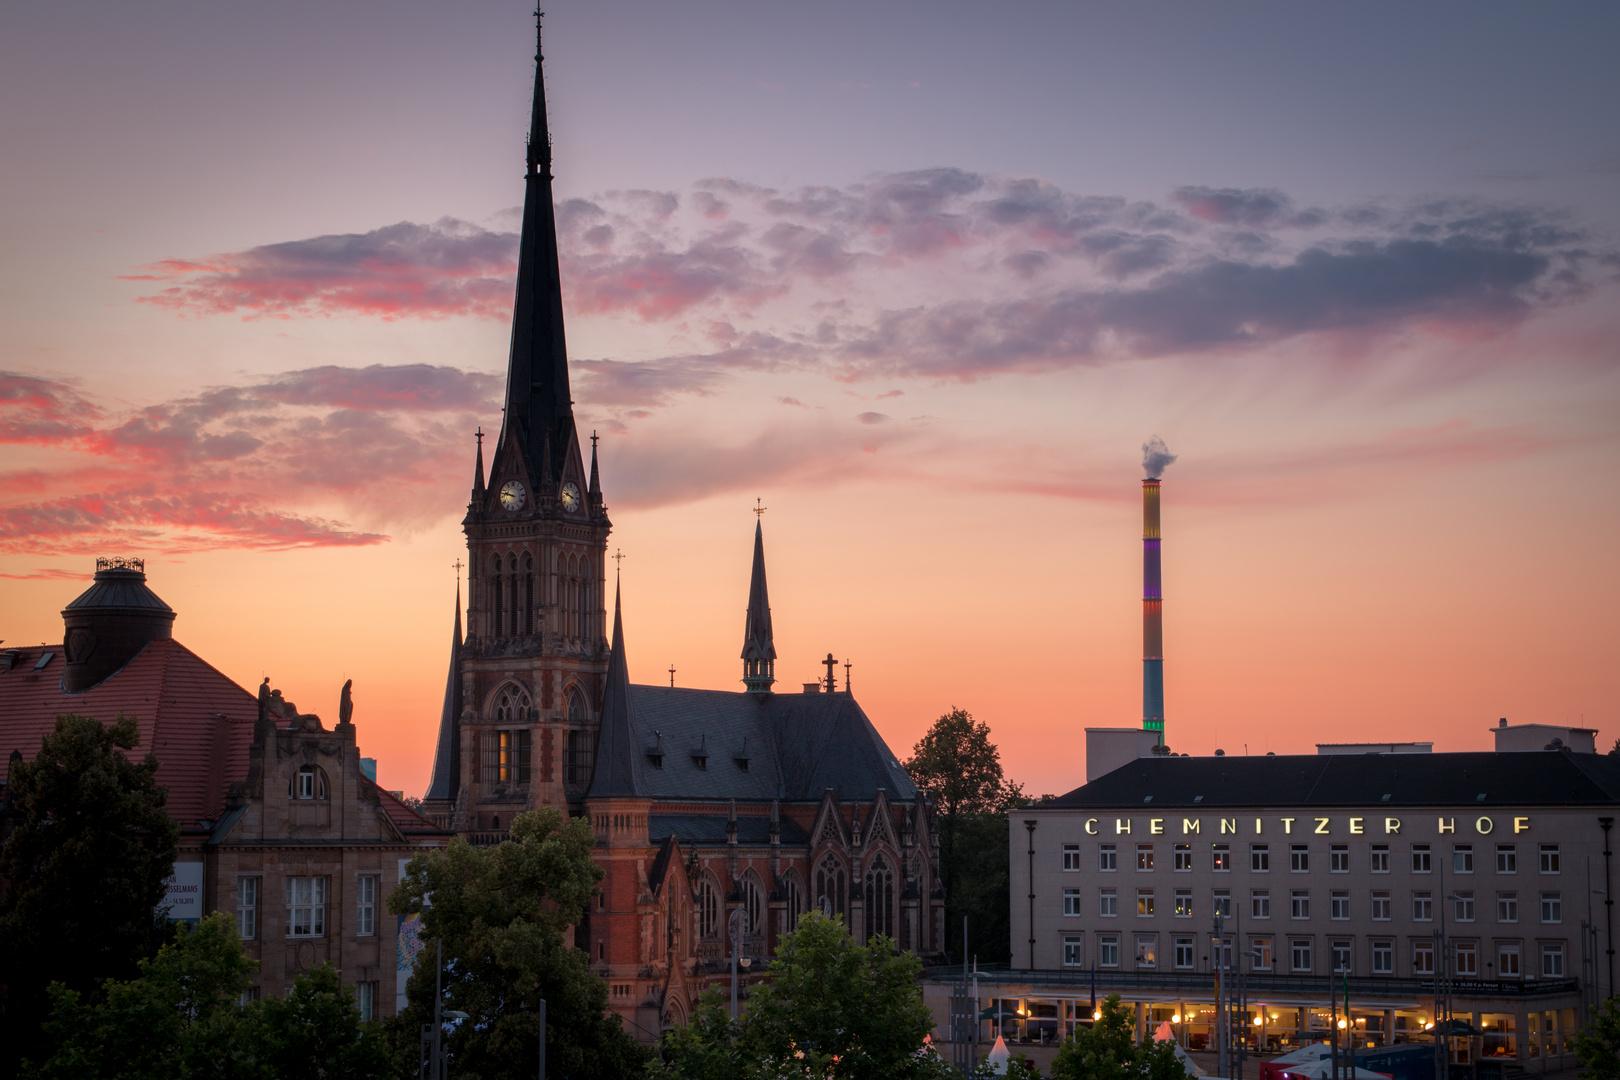 Chemnitz Theaterplatz HDR